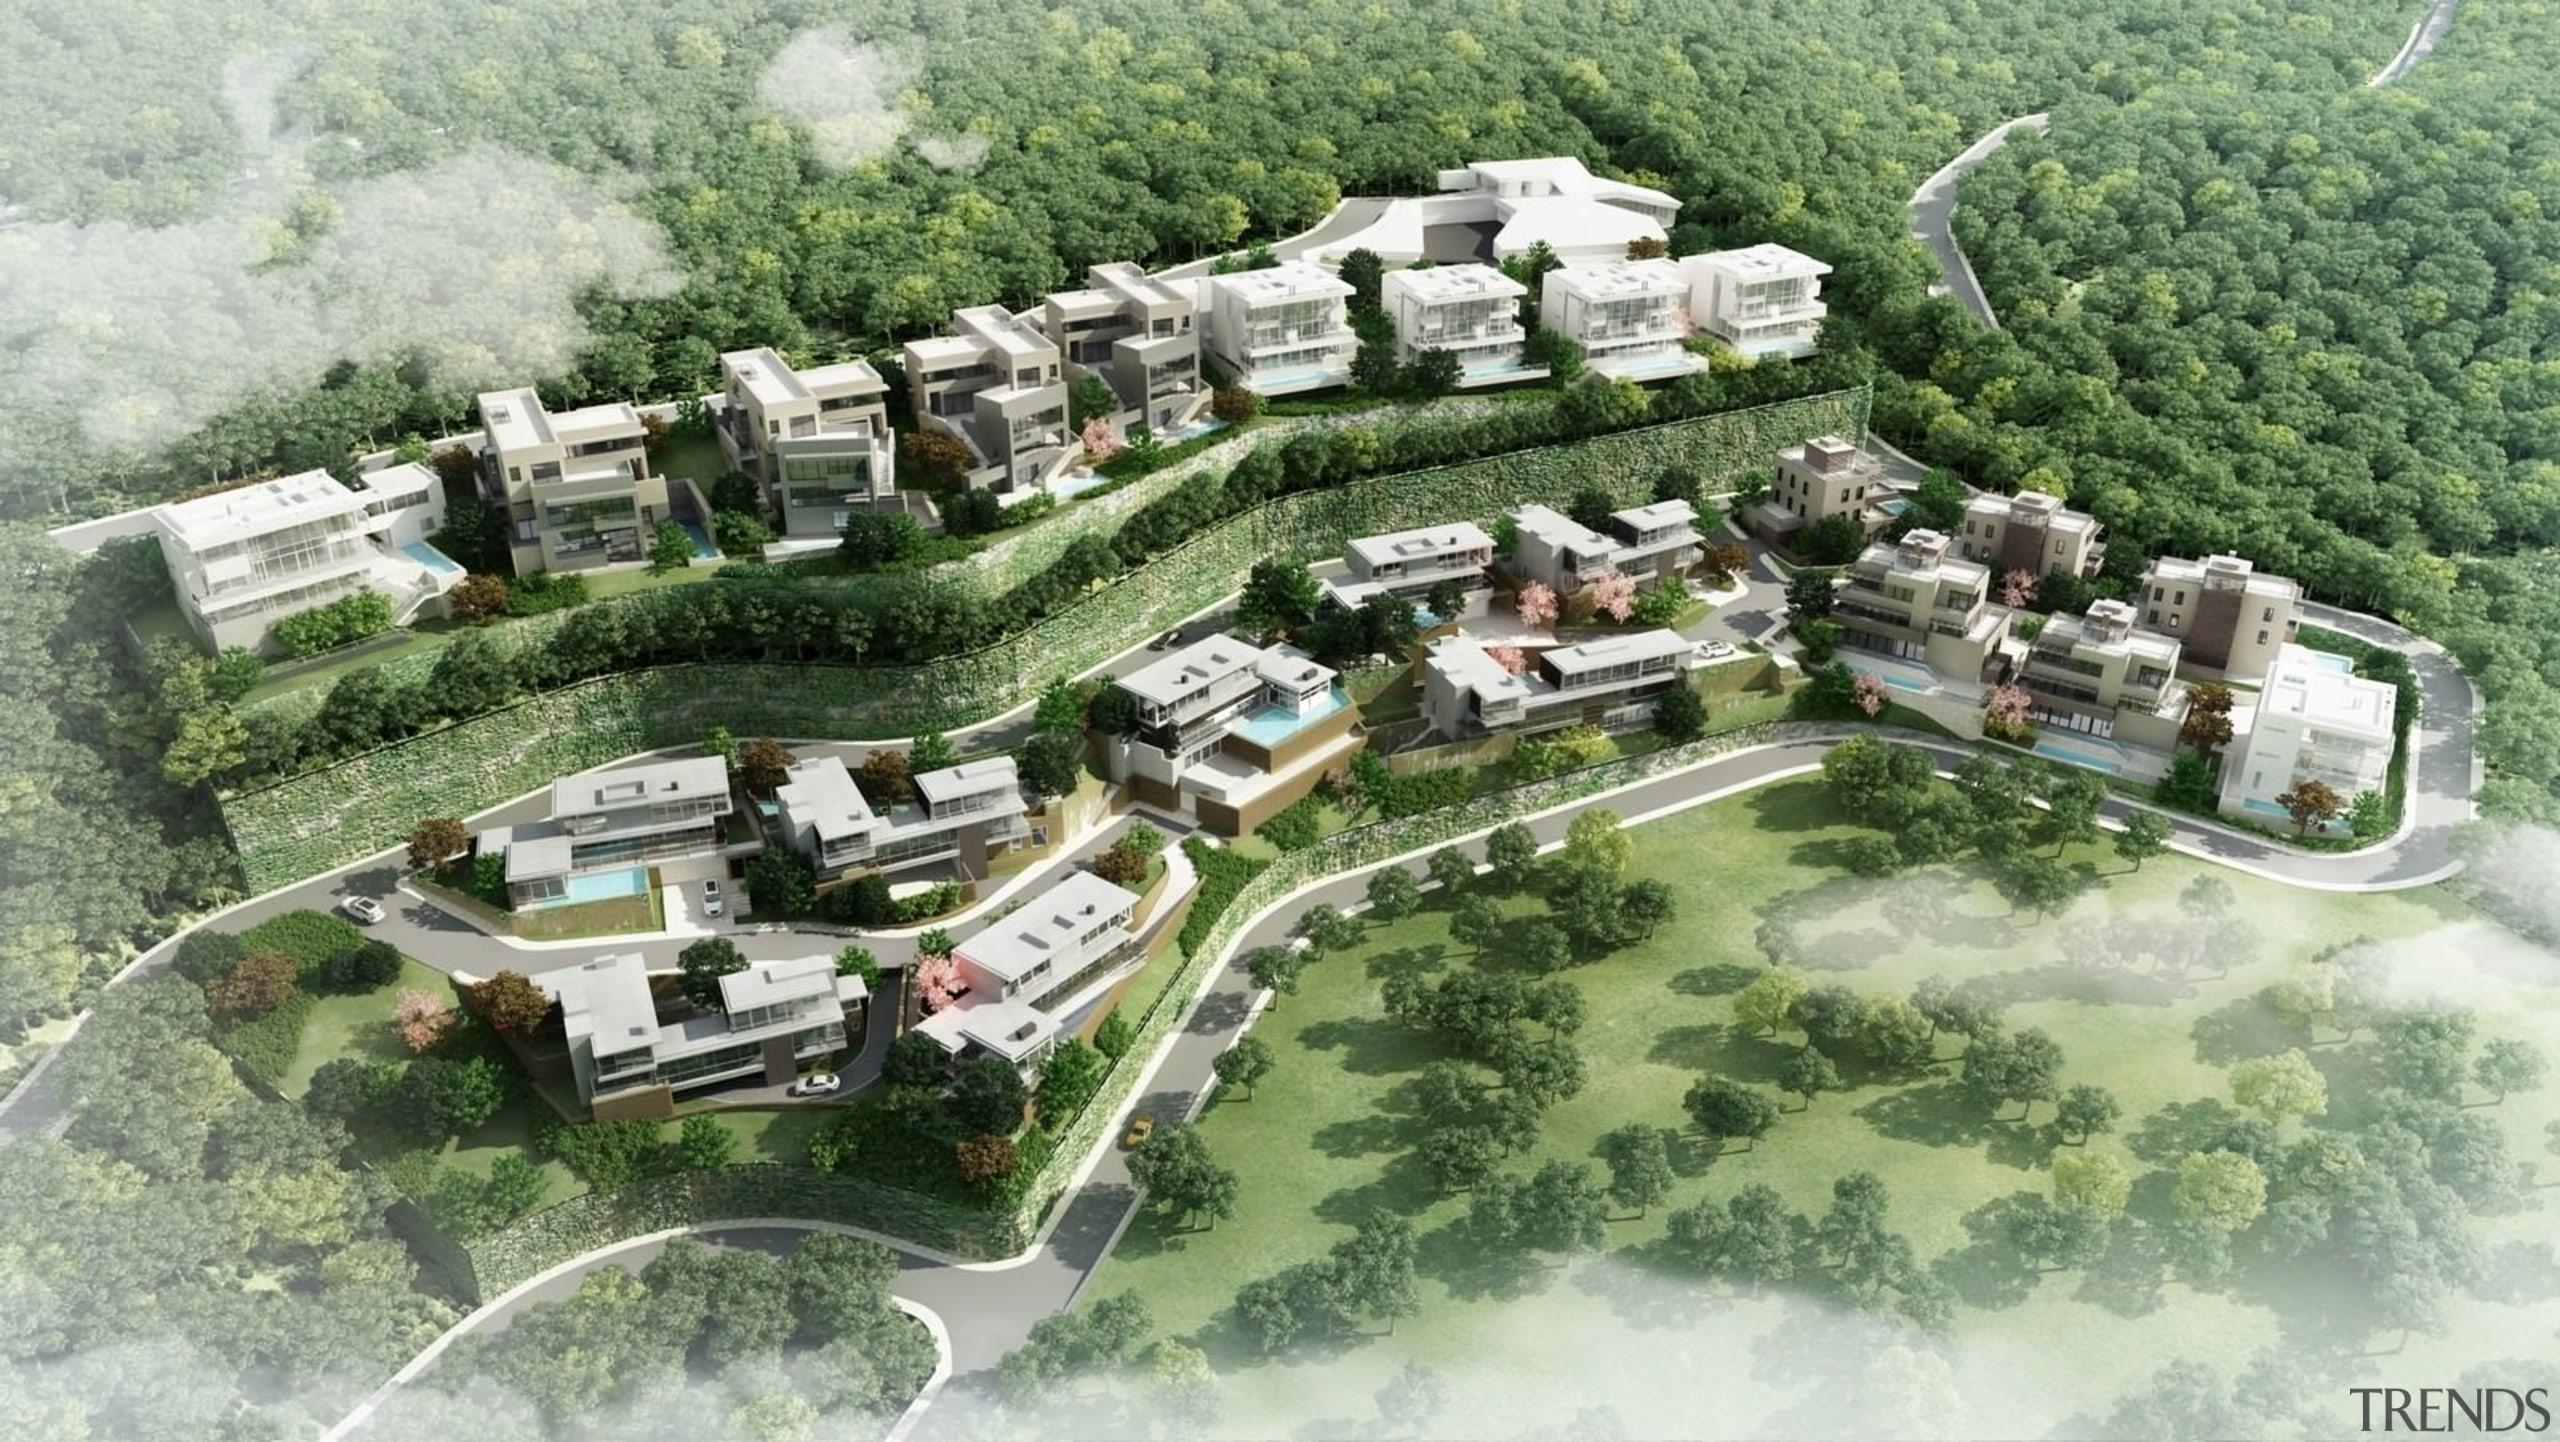 Site Rendering - Premia - bird's eye view bird's eye view, estate, land lot, mixed use, neighbourhood, residential area, suburb, urban design, village, green